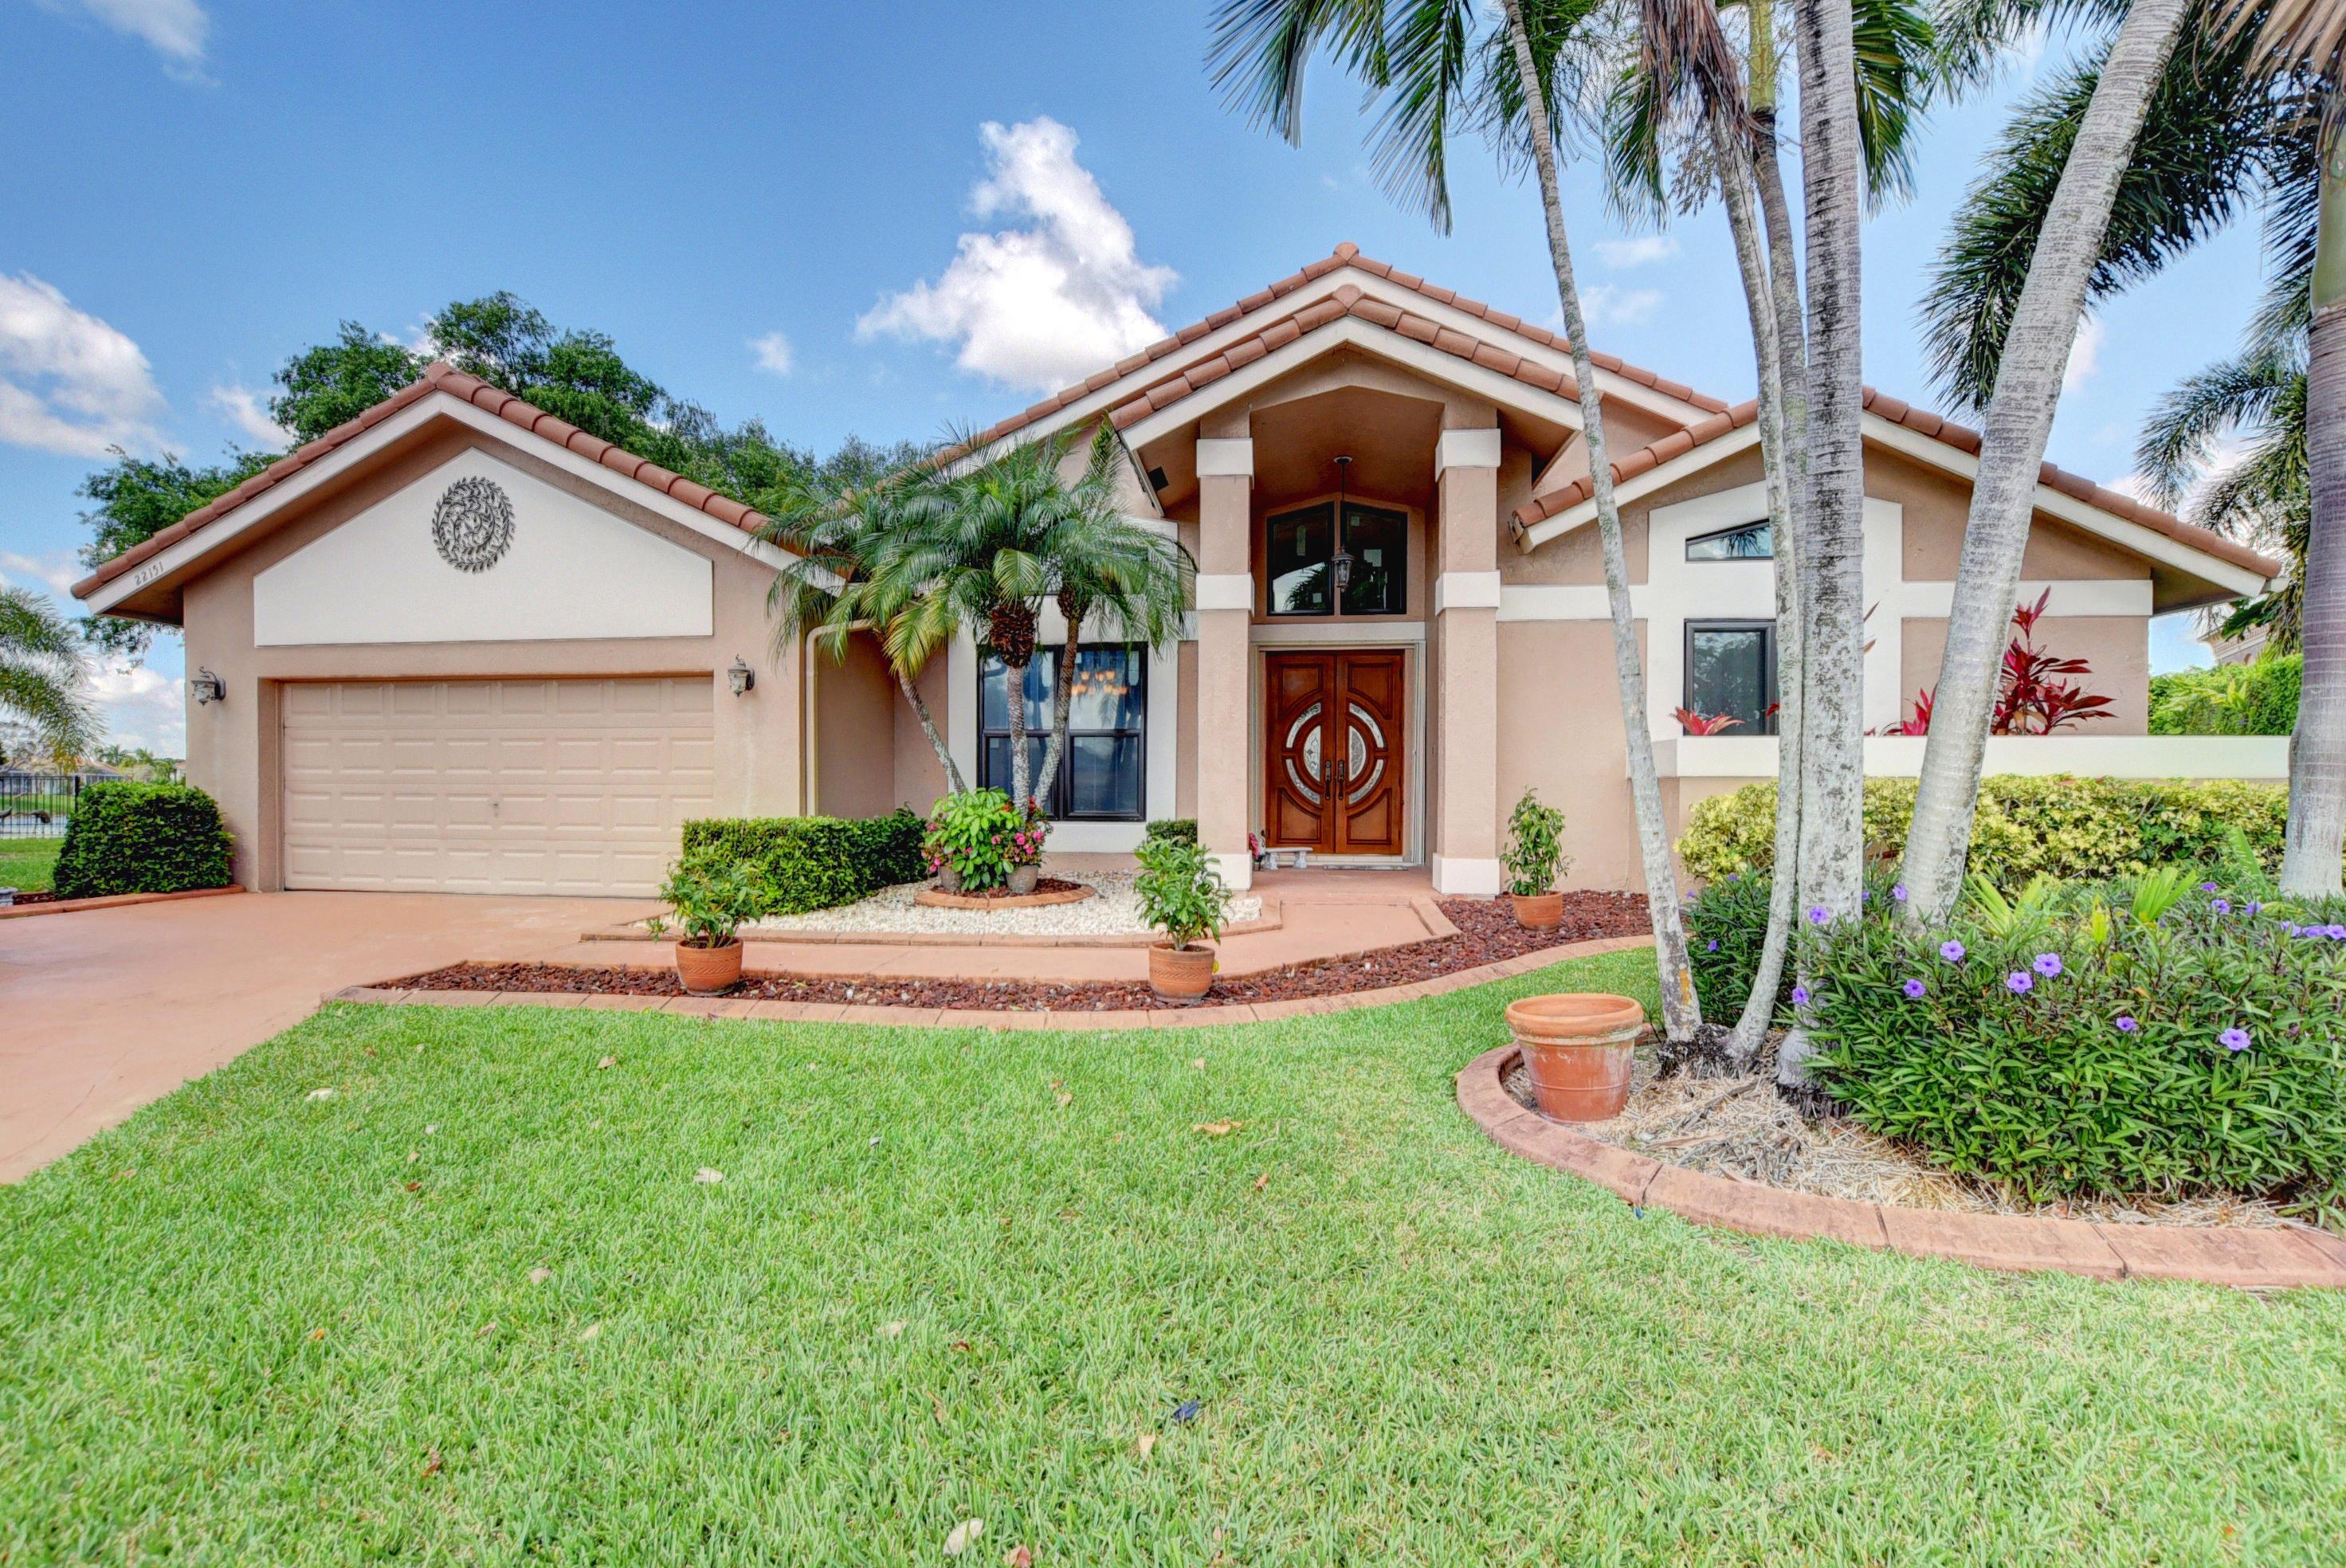 22151 Crofton Court Boca Raton, FL 33428